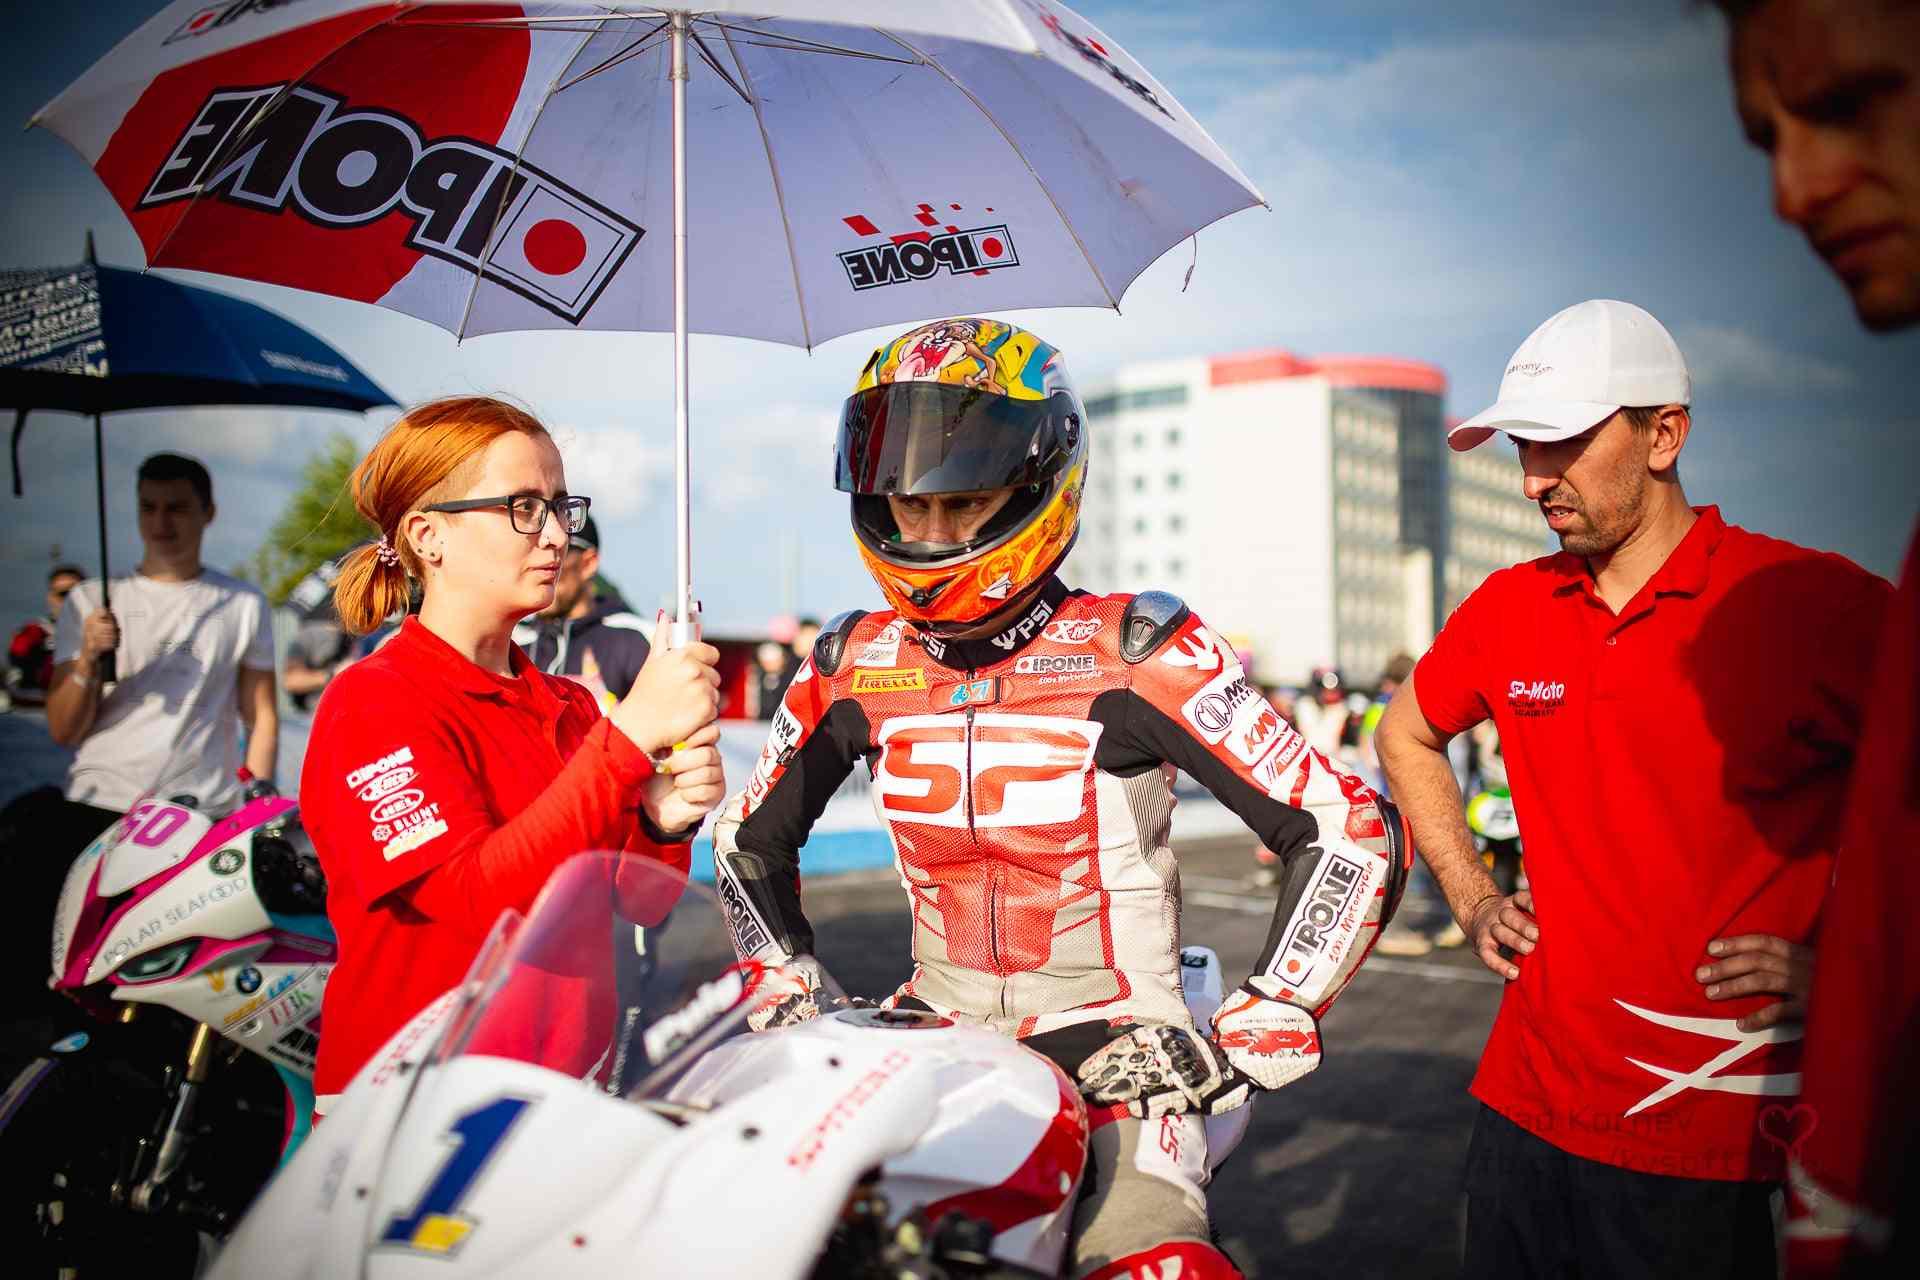 5-6_etap_MotoGPUkraine_138